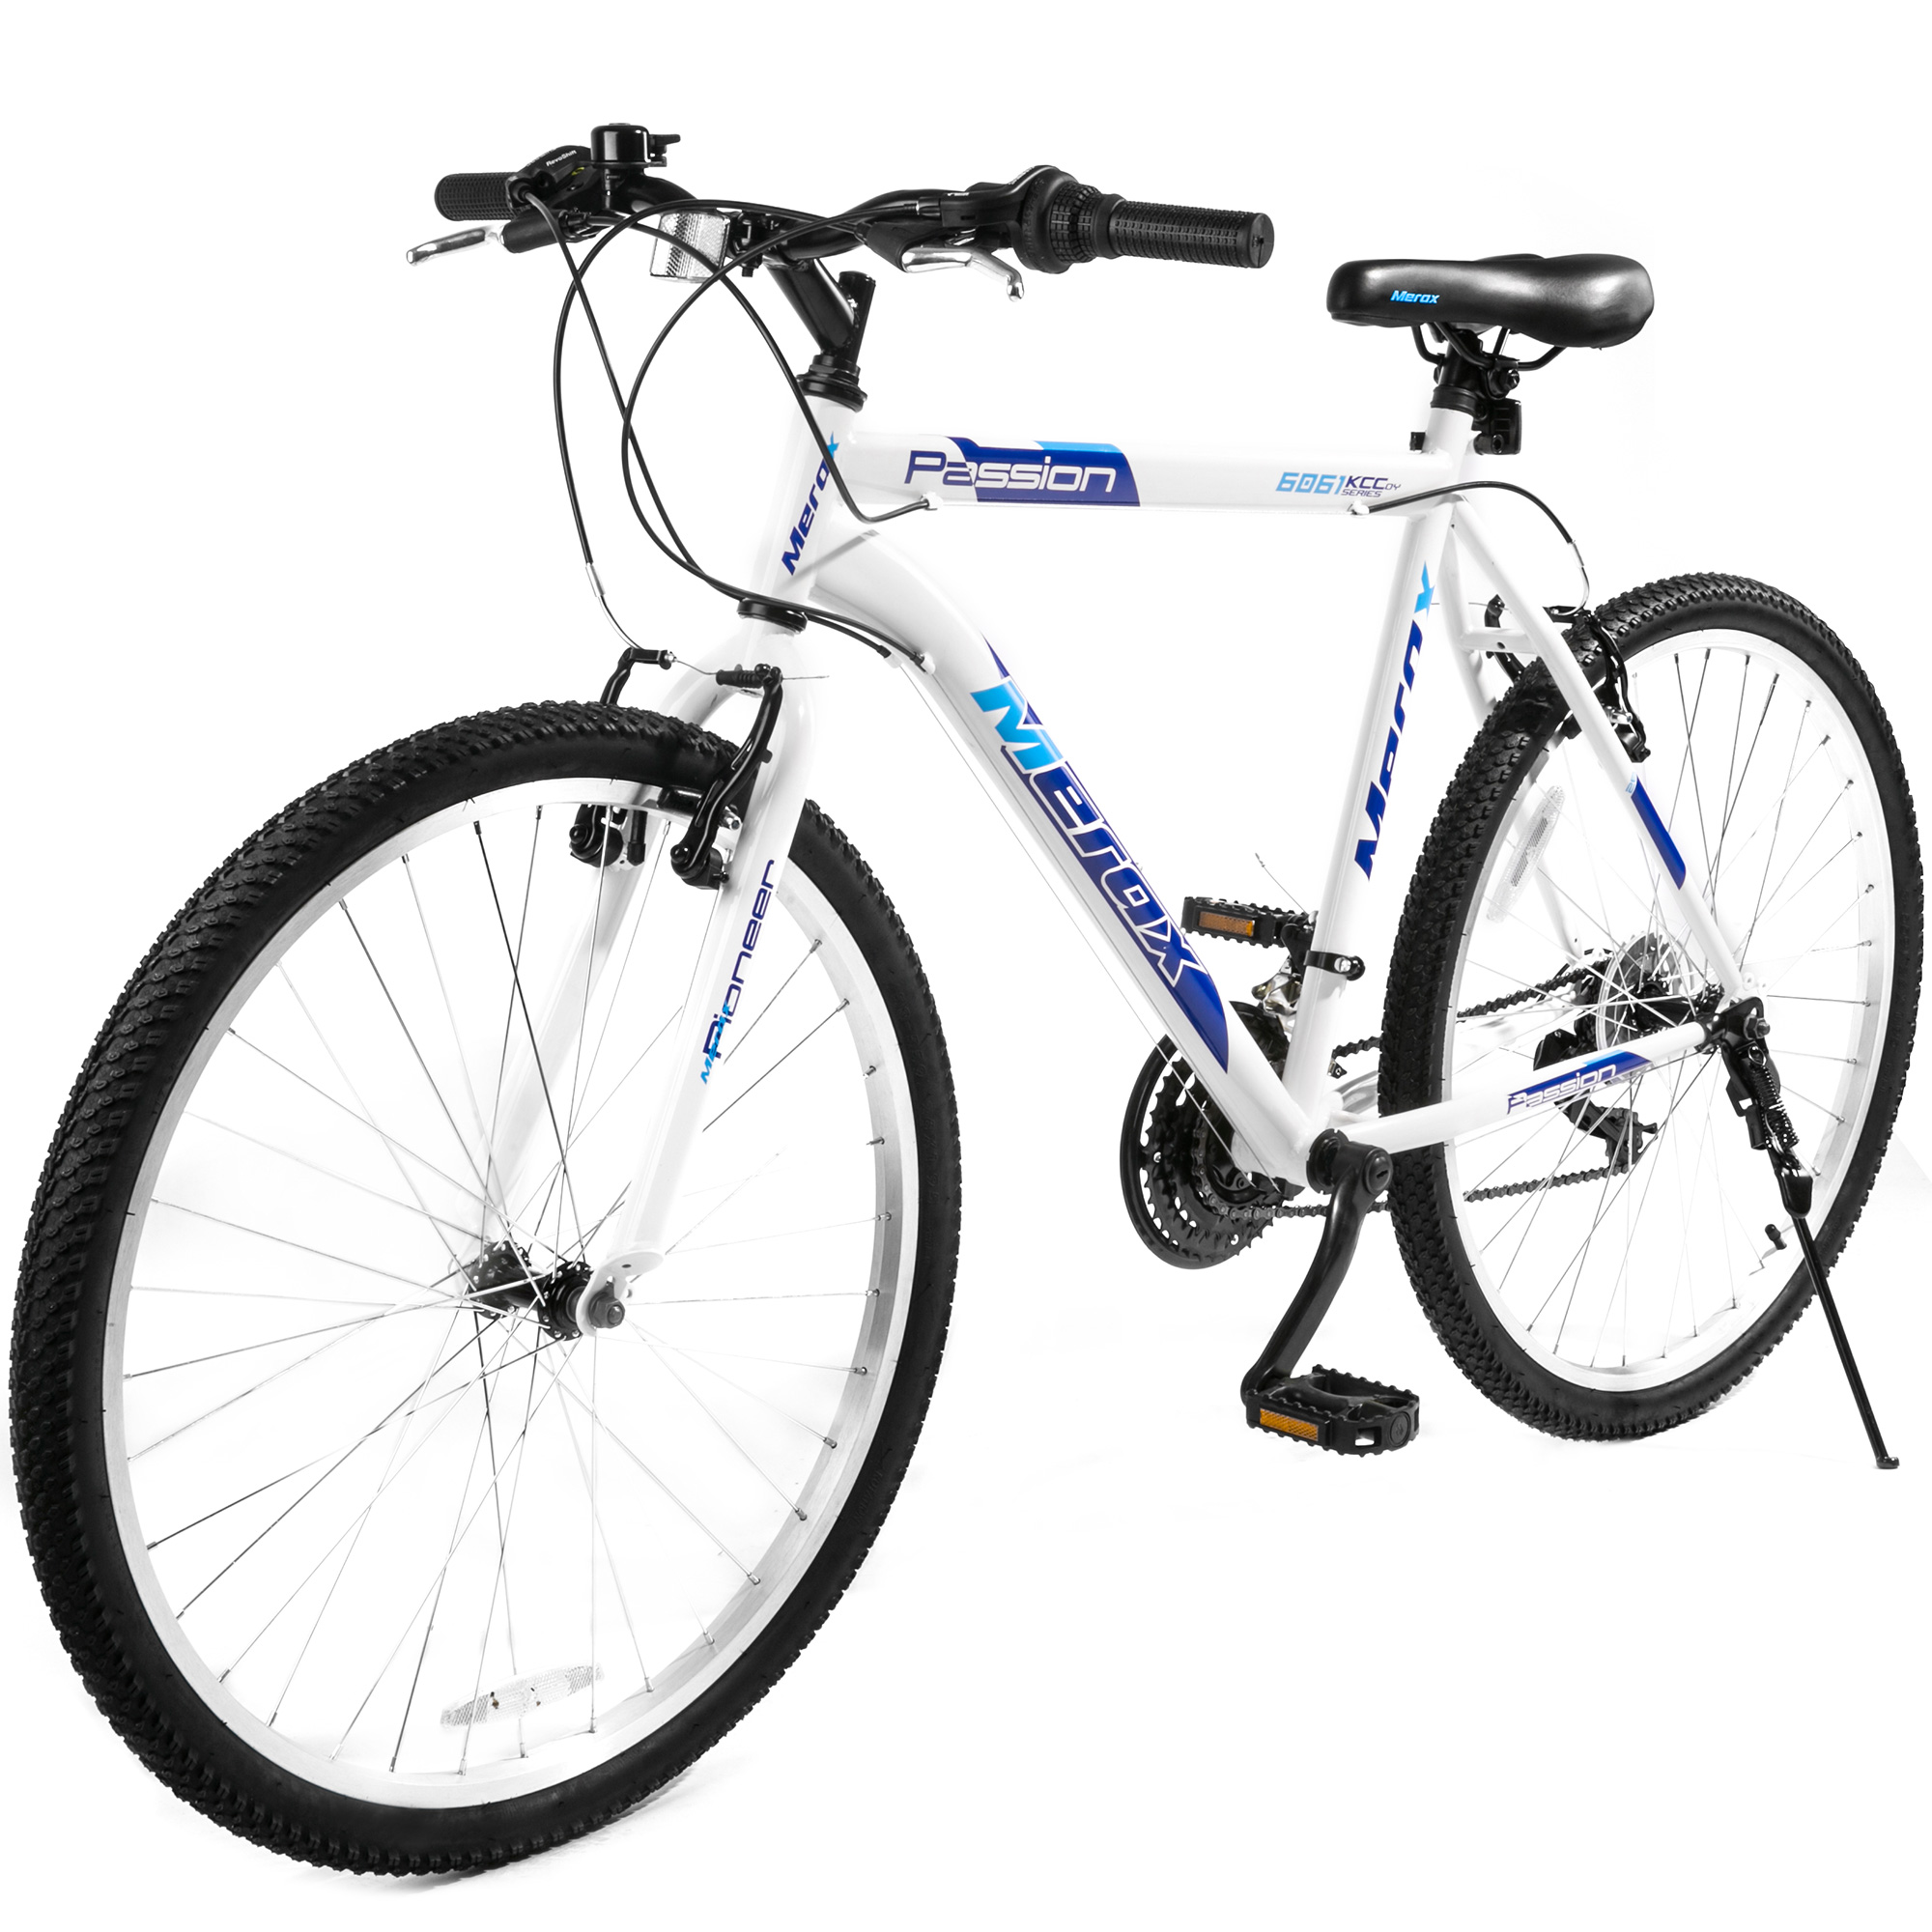 "Merax 26"" Pioneer Aluminum Frame Mountain Bike, Multiple Colors"